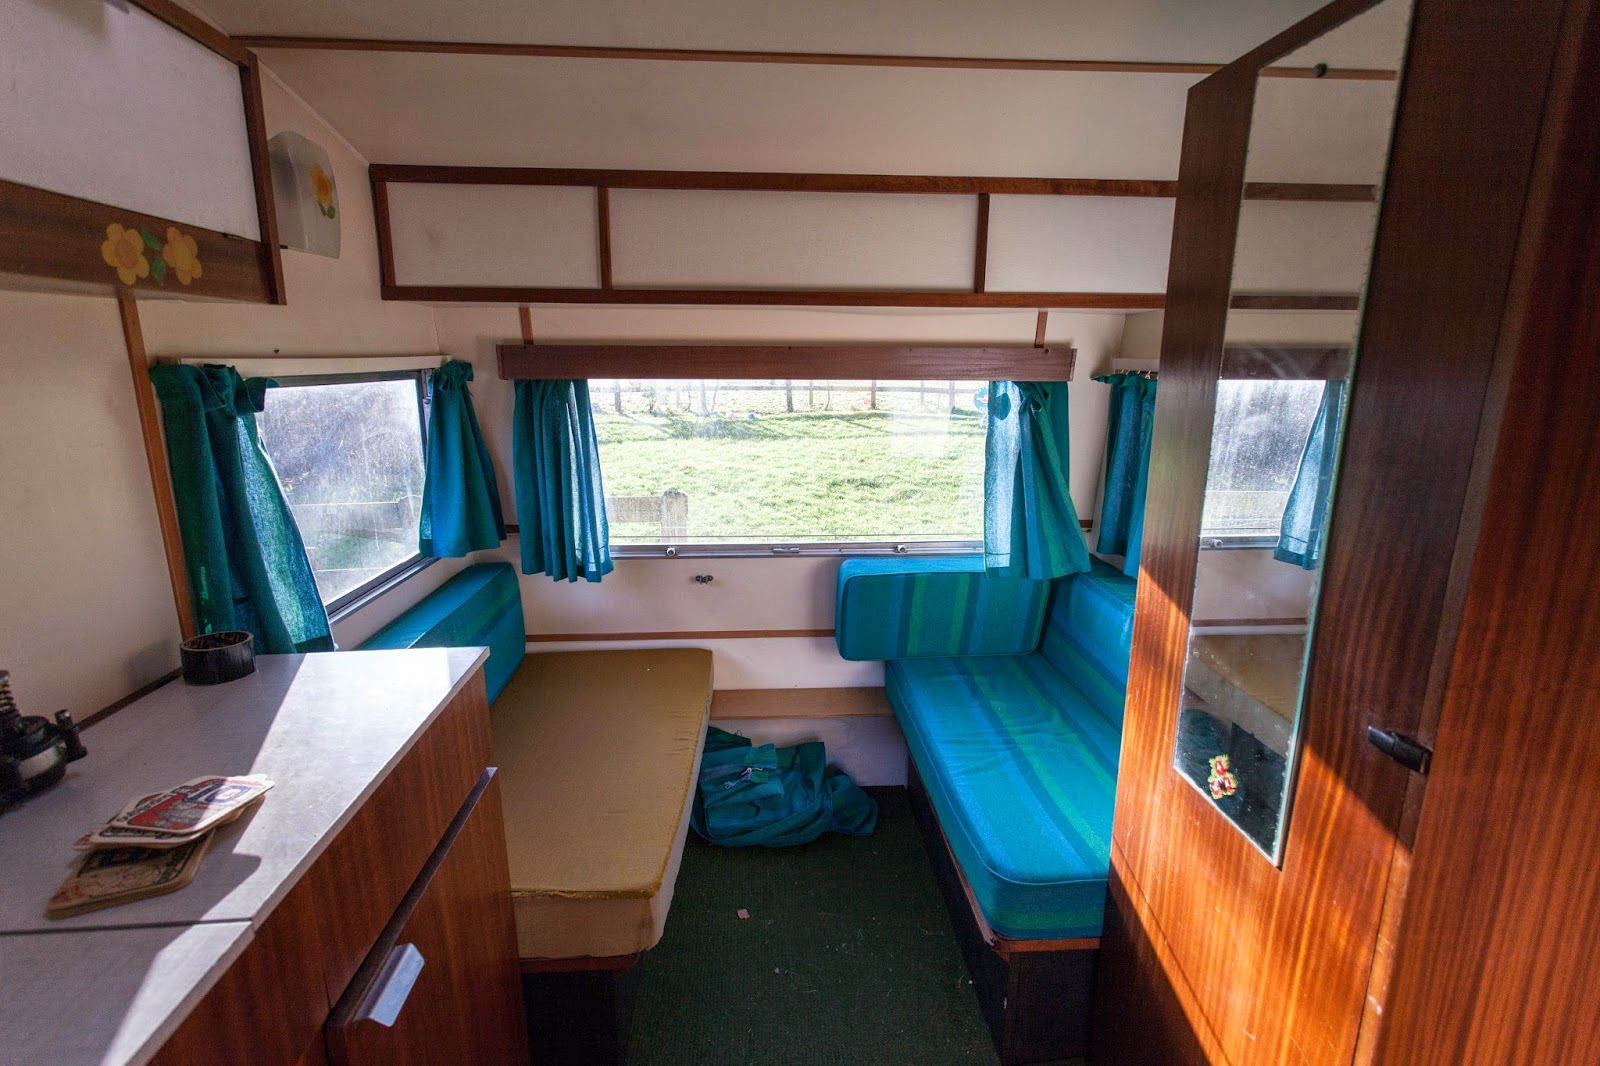 Grubby Cottage Vintage Caravan Interior Before Images